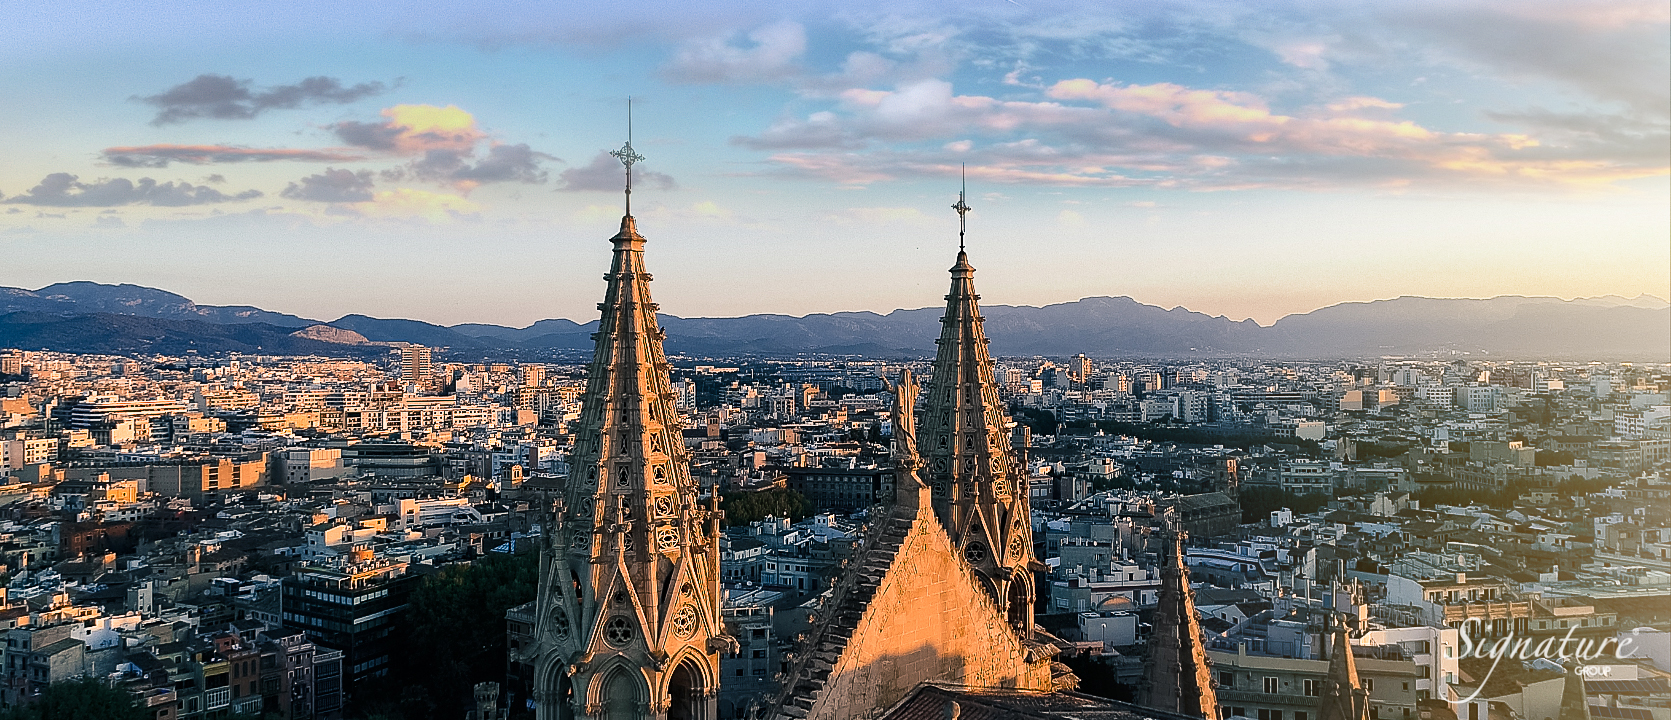 Catedral de Mallorca overlooking the Tramuntana mountain range